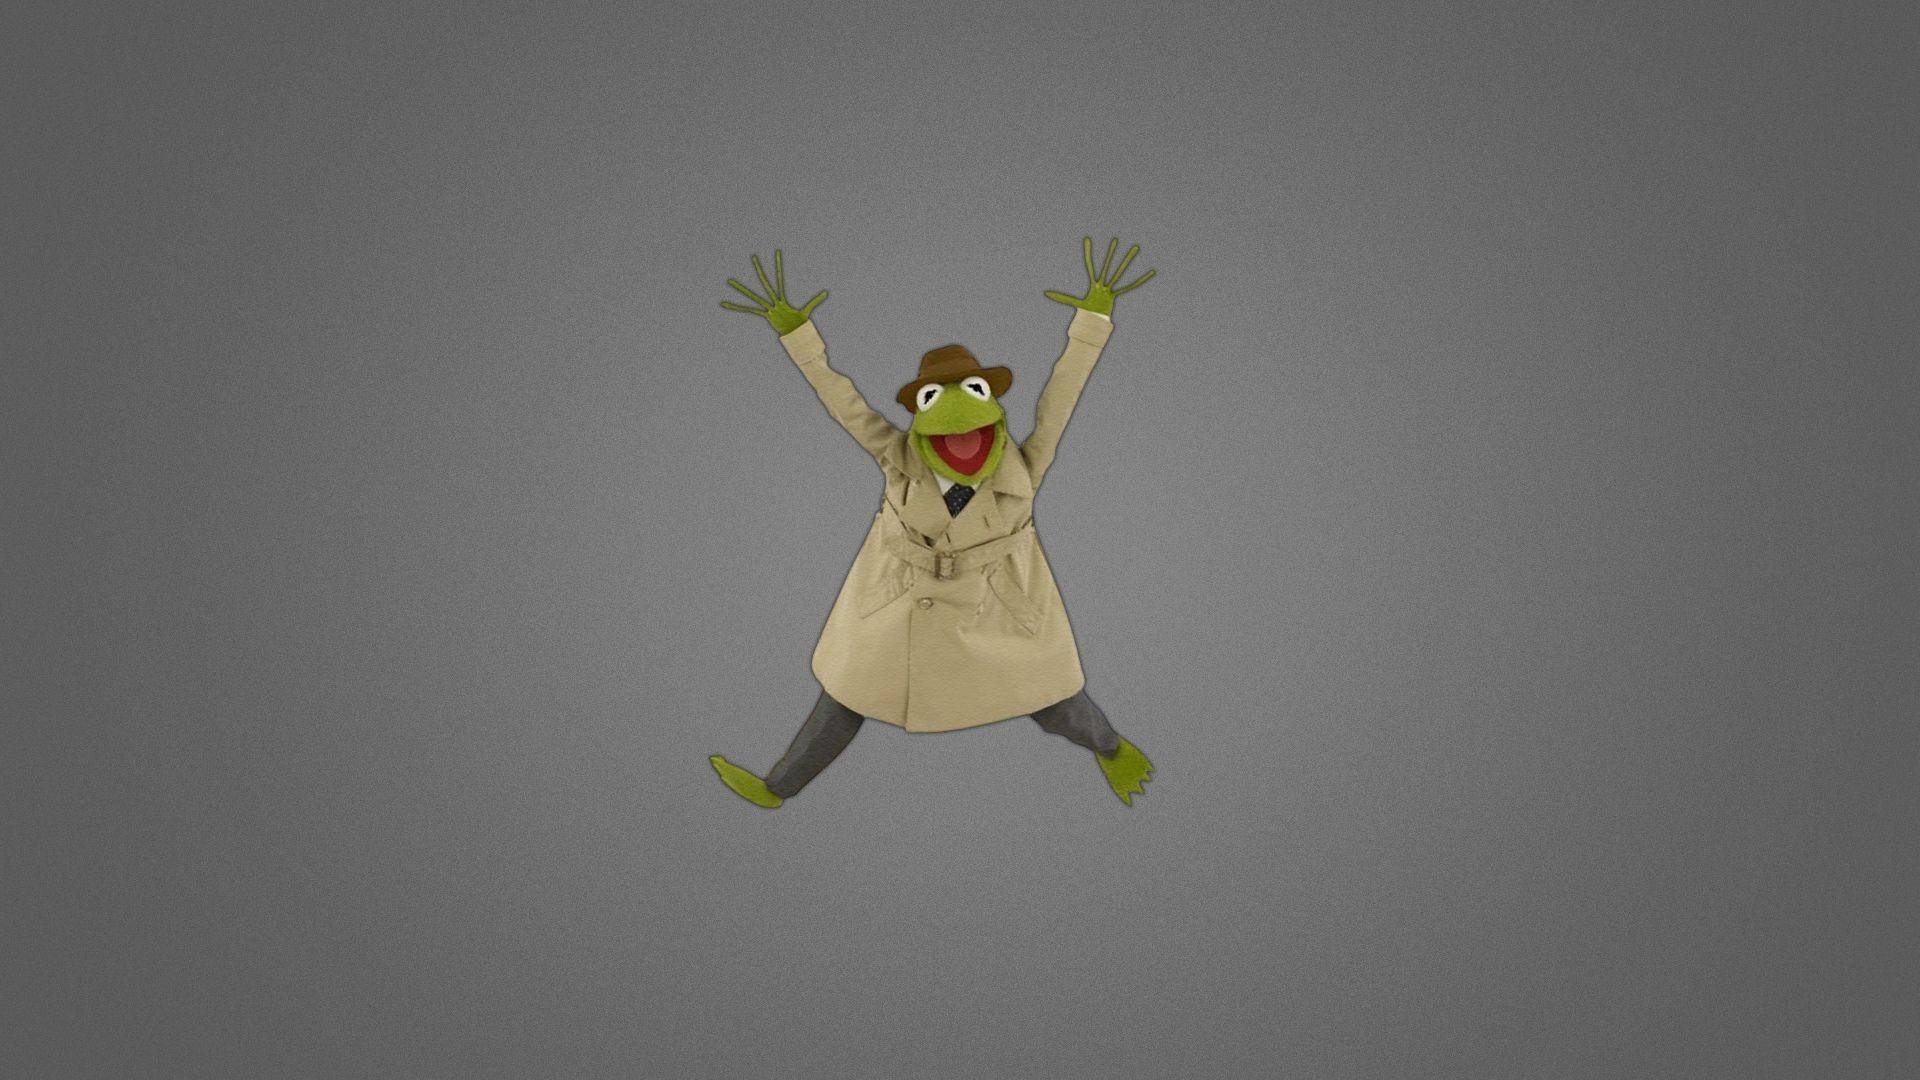 Hearts Kermit The Frog Full HD Wallpaper